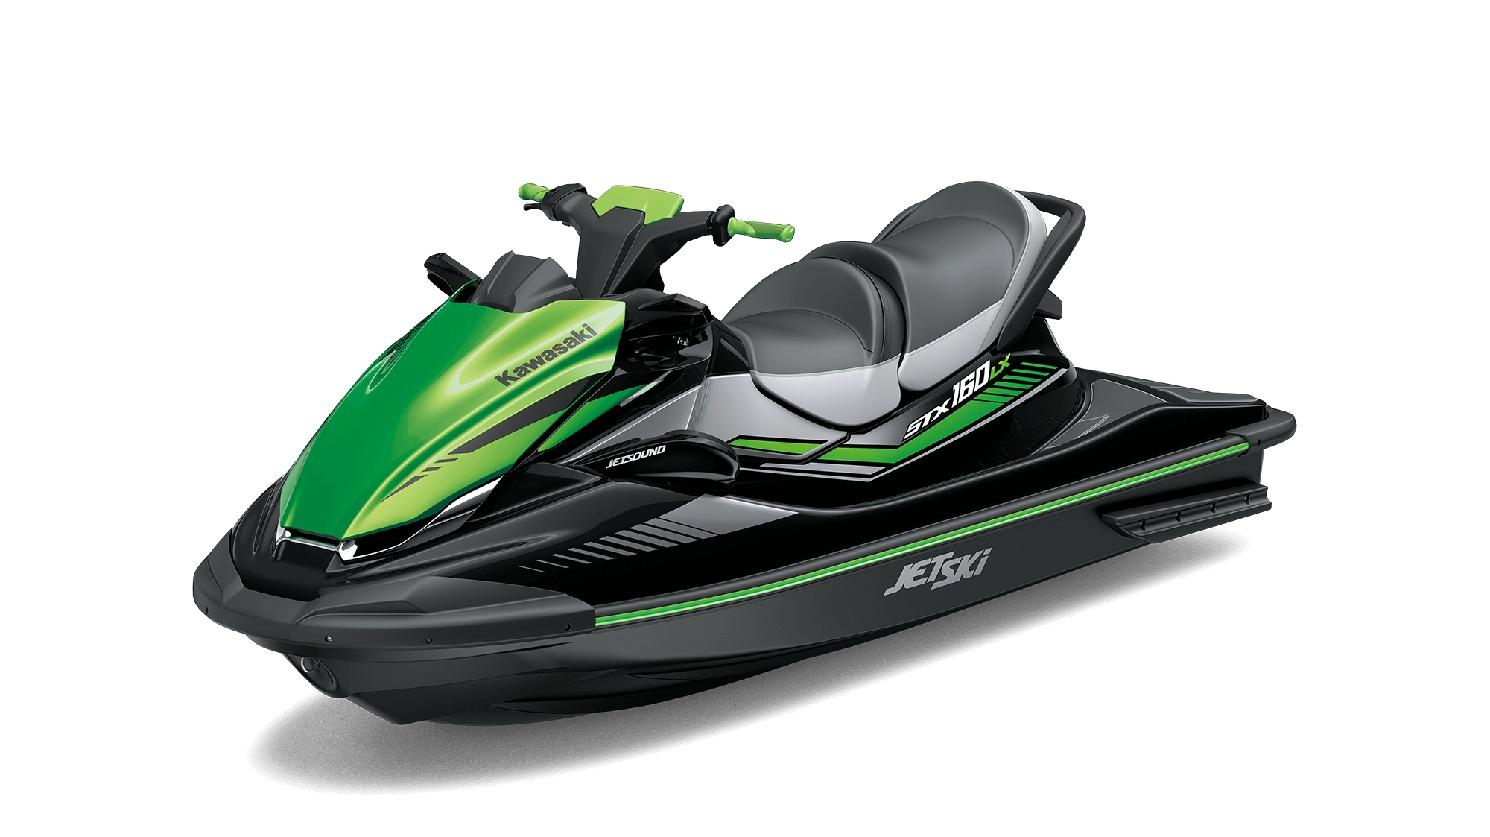 2021 Kawasaki JET SKI STX 160LX Ebony / Candy Lime Green